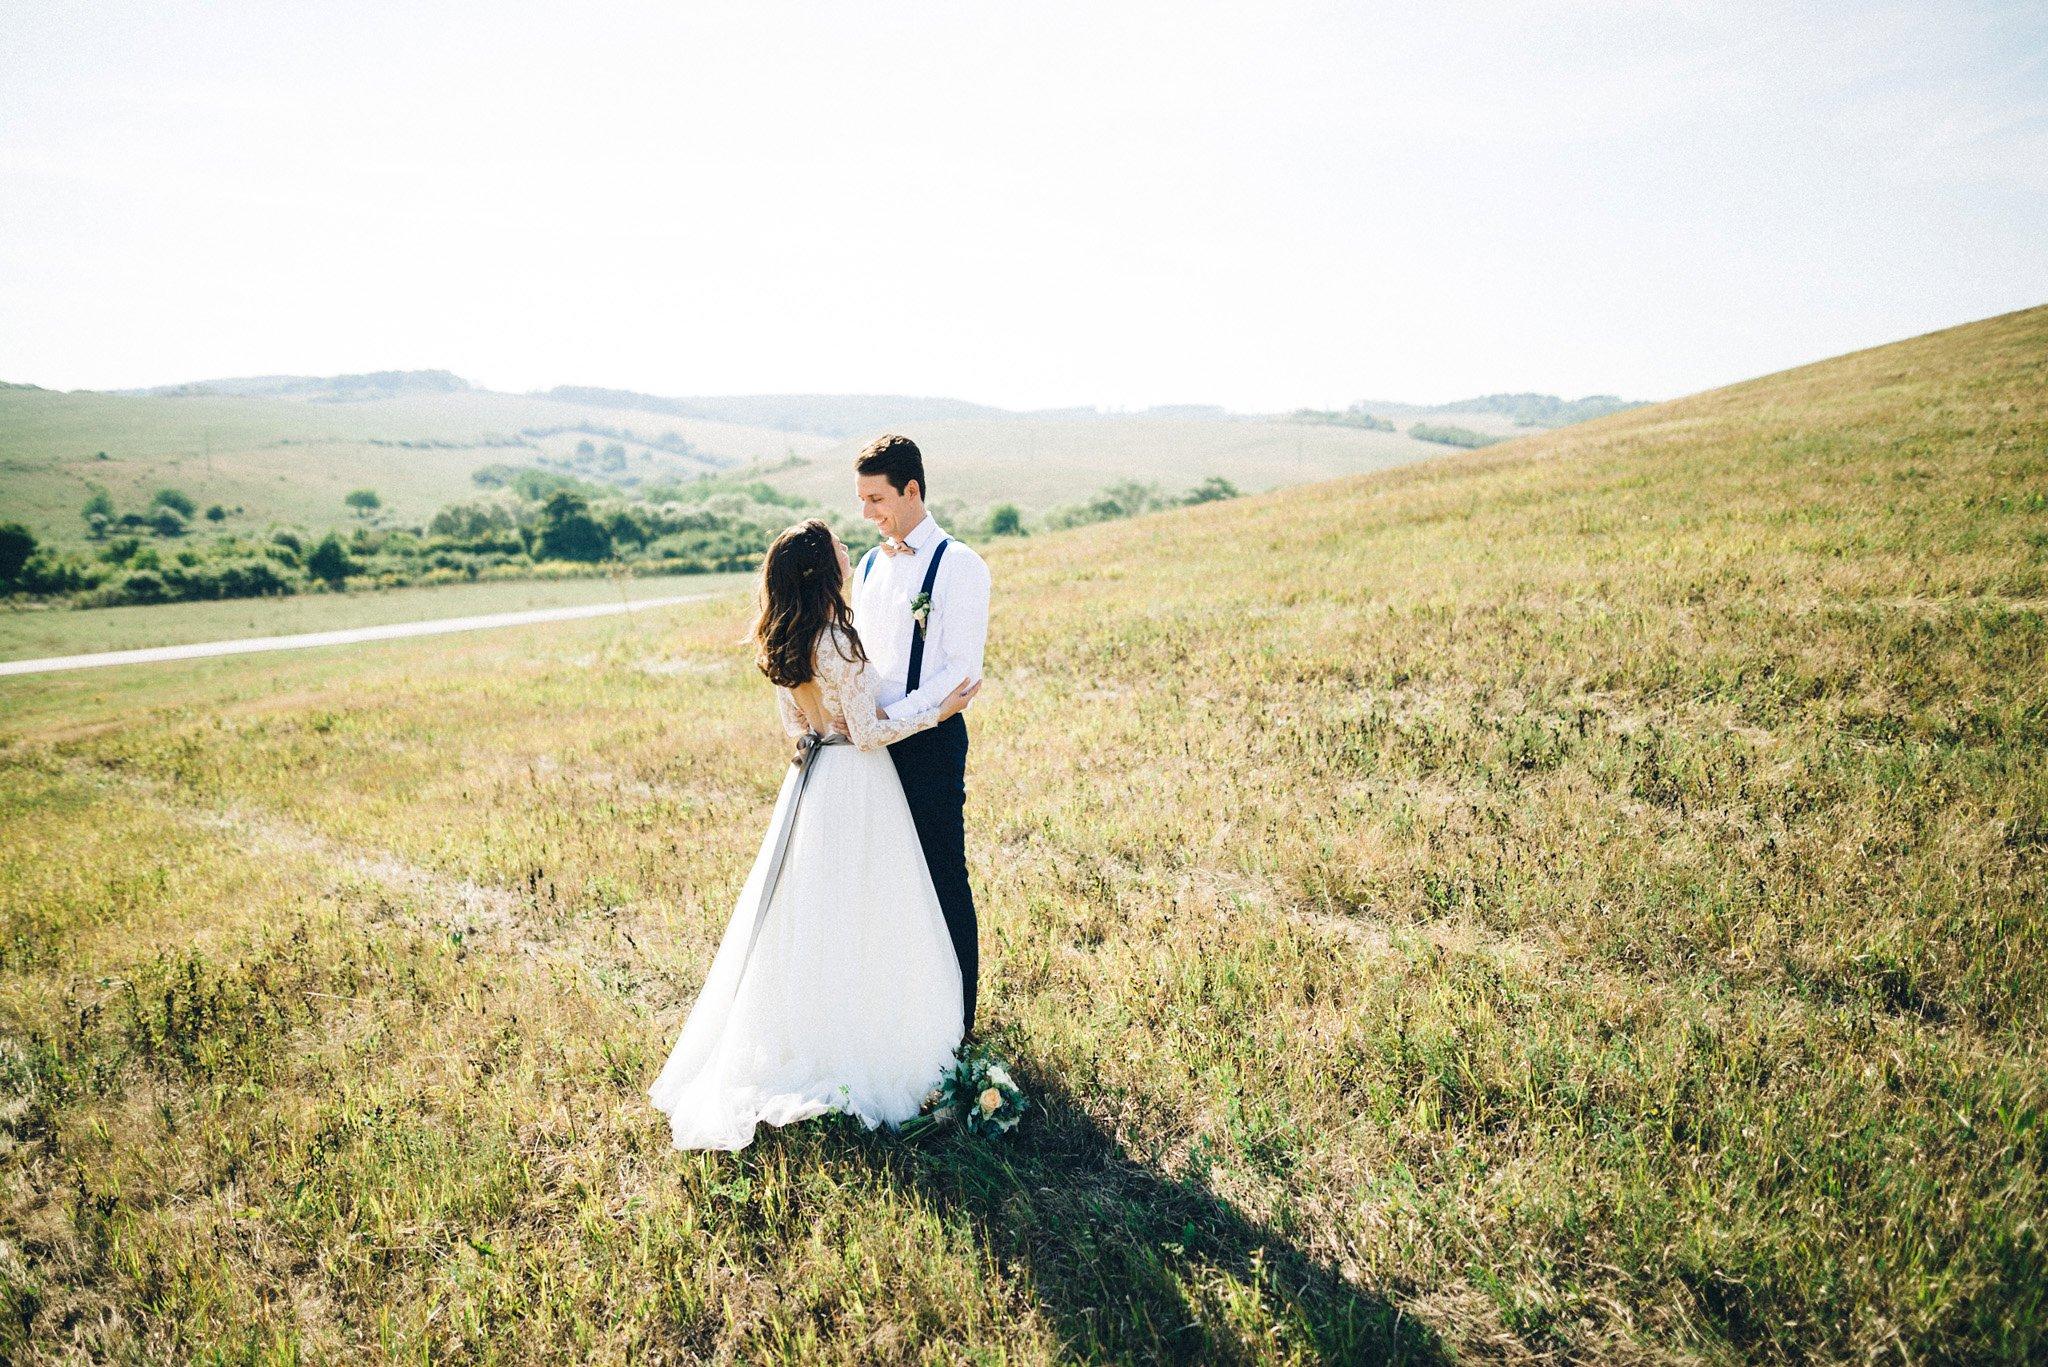 32-hungary-wedding-photography-destination